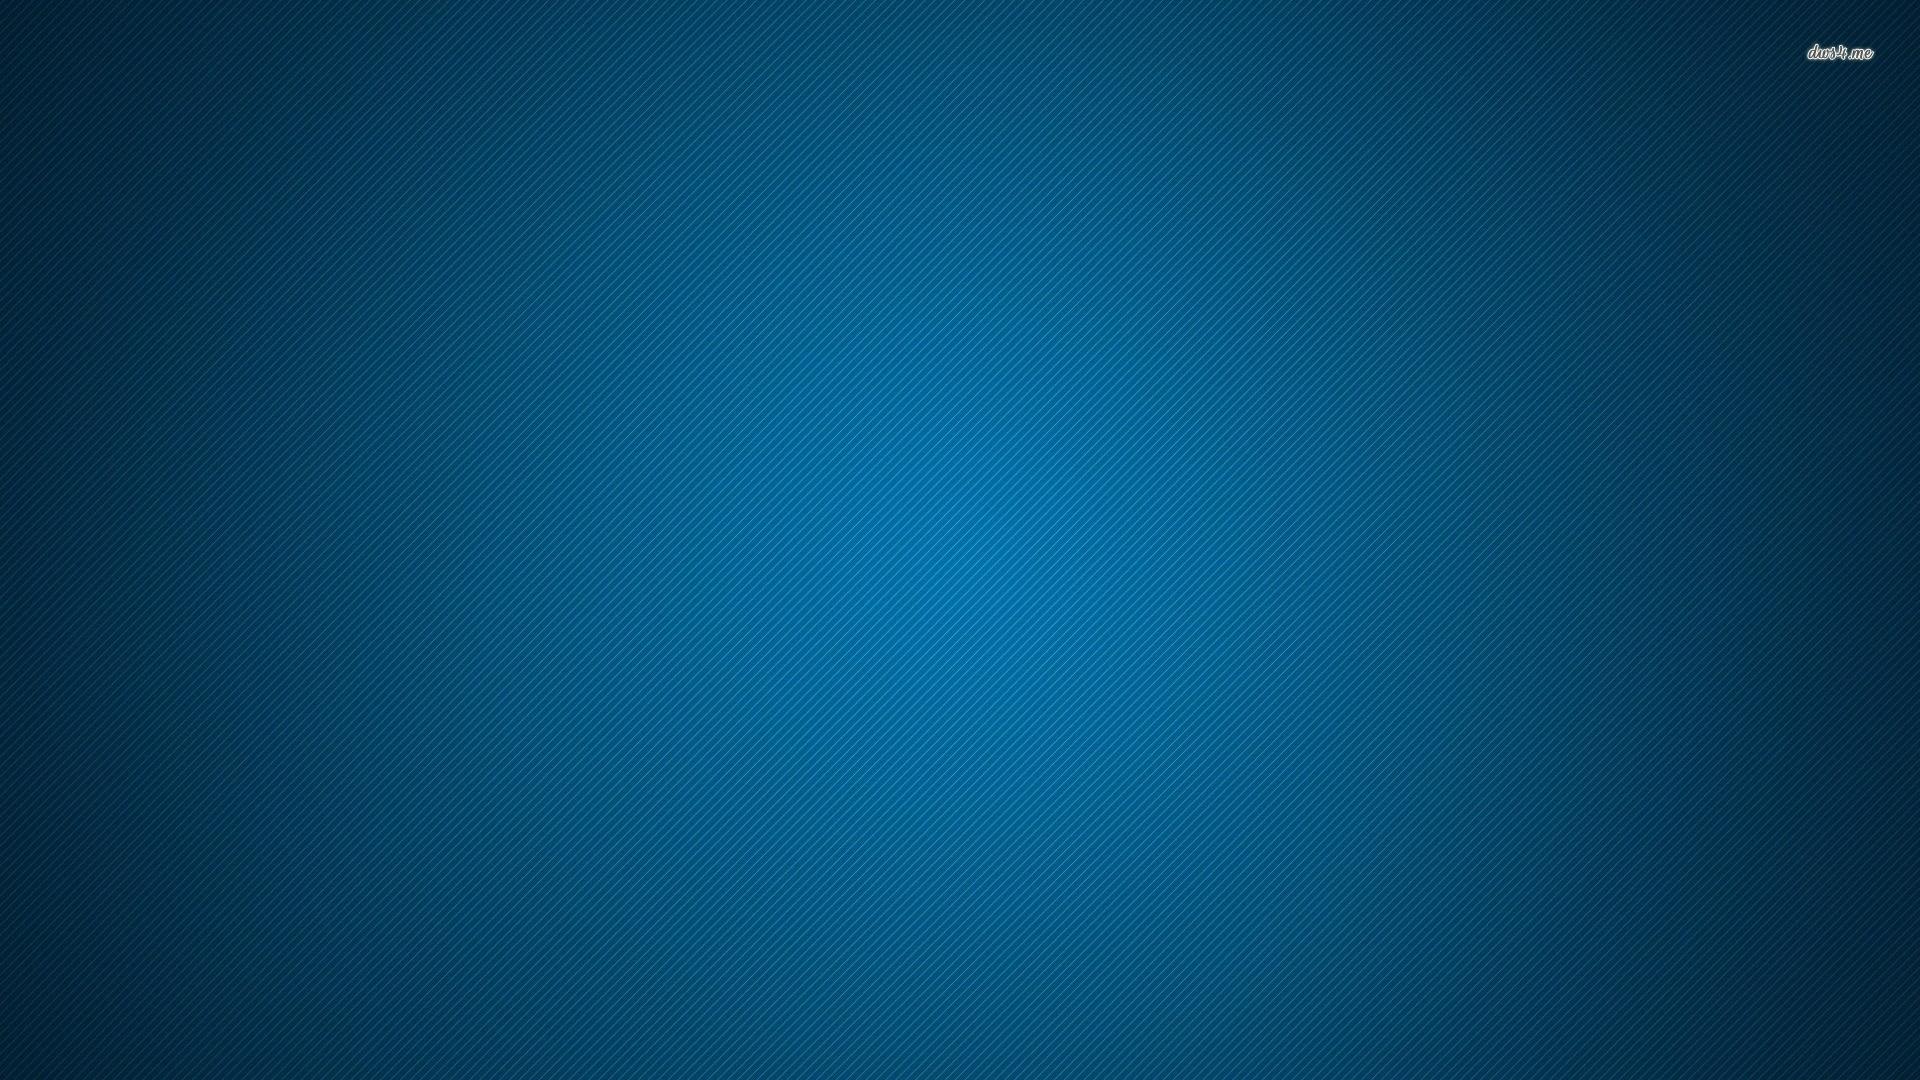 Res: 1920x1080, Home; blue-gradient-texture-wallpaper-3